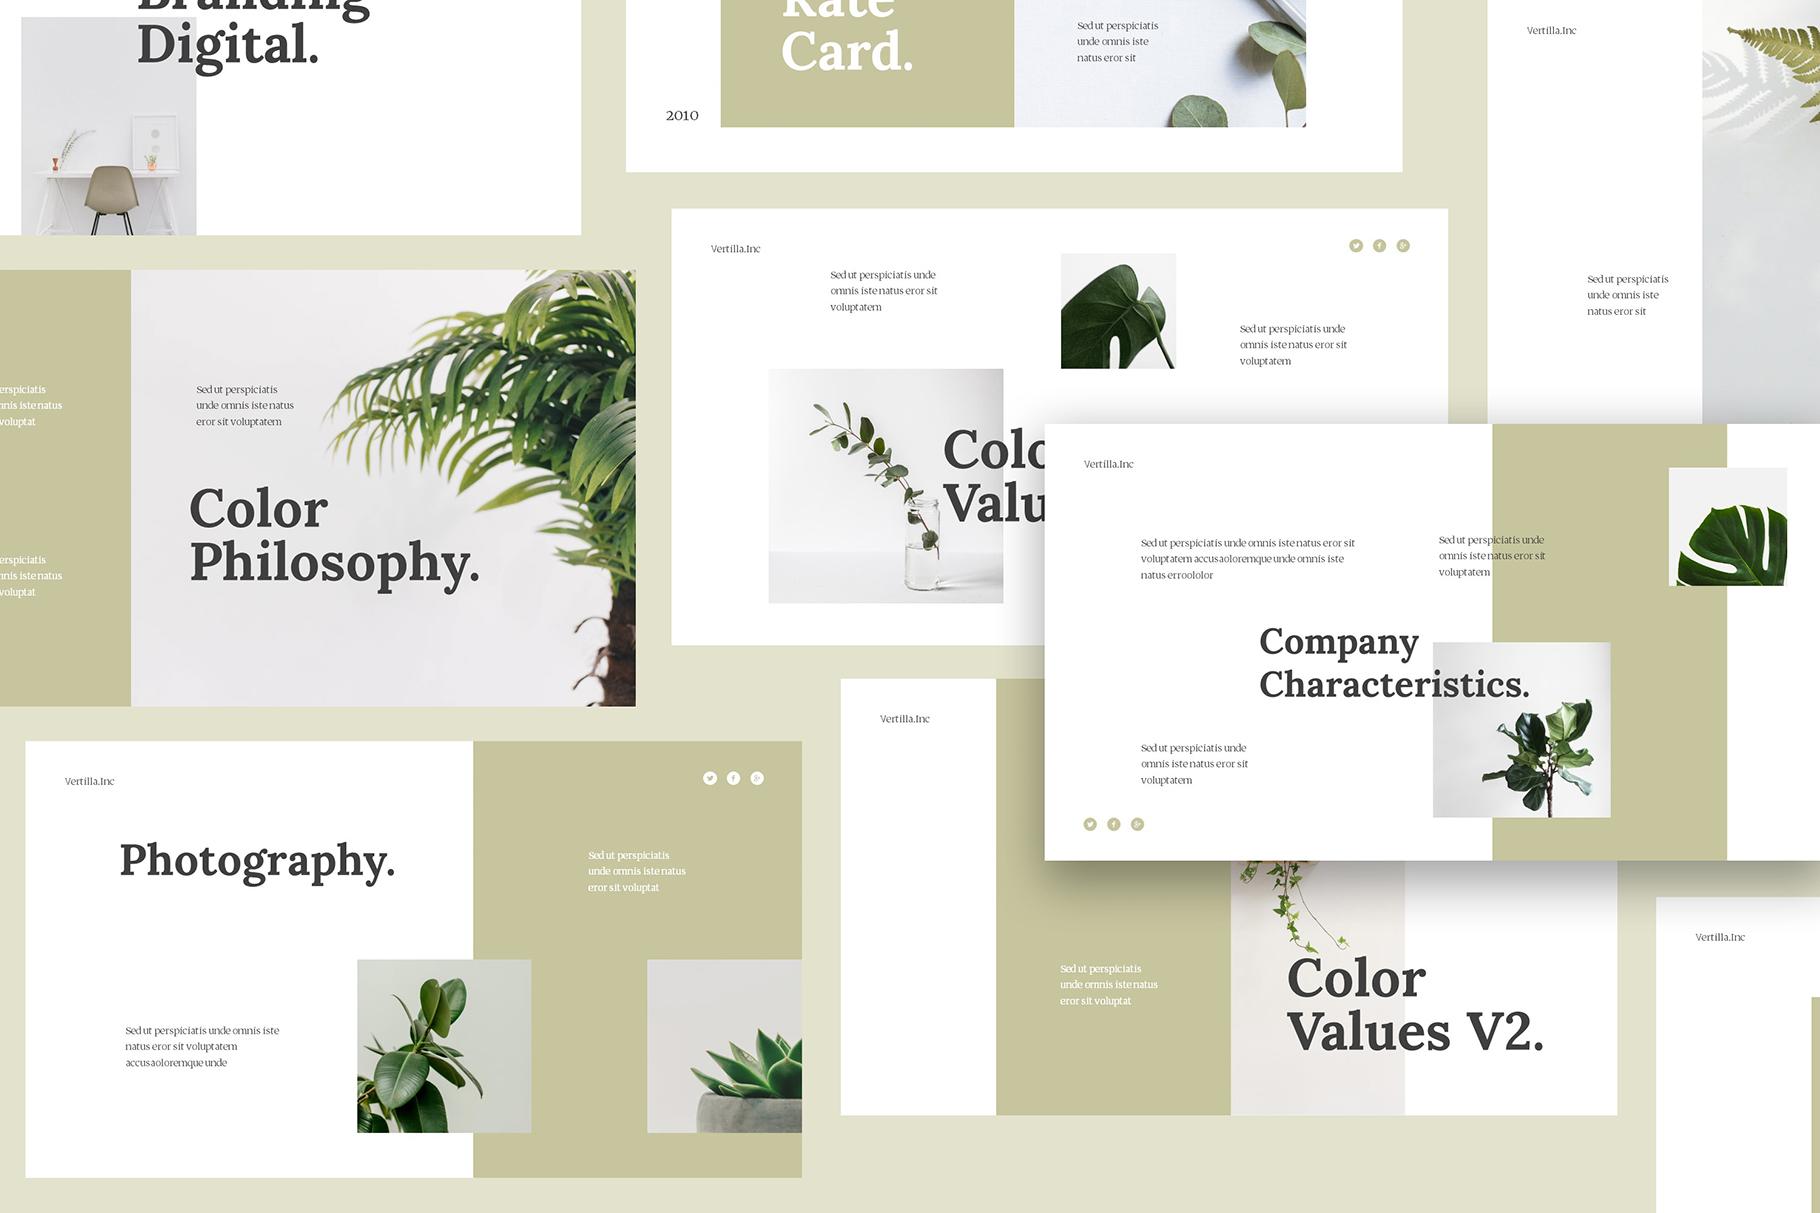 Vertilla-Brand Guideline Keynote example image 3